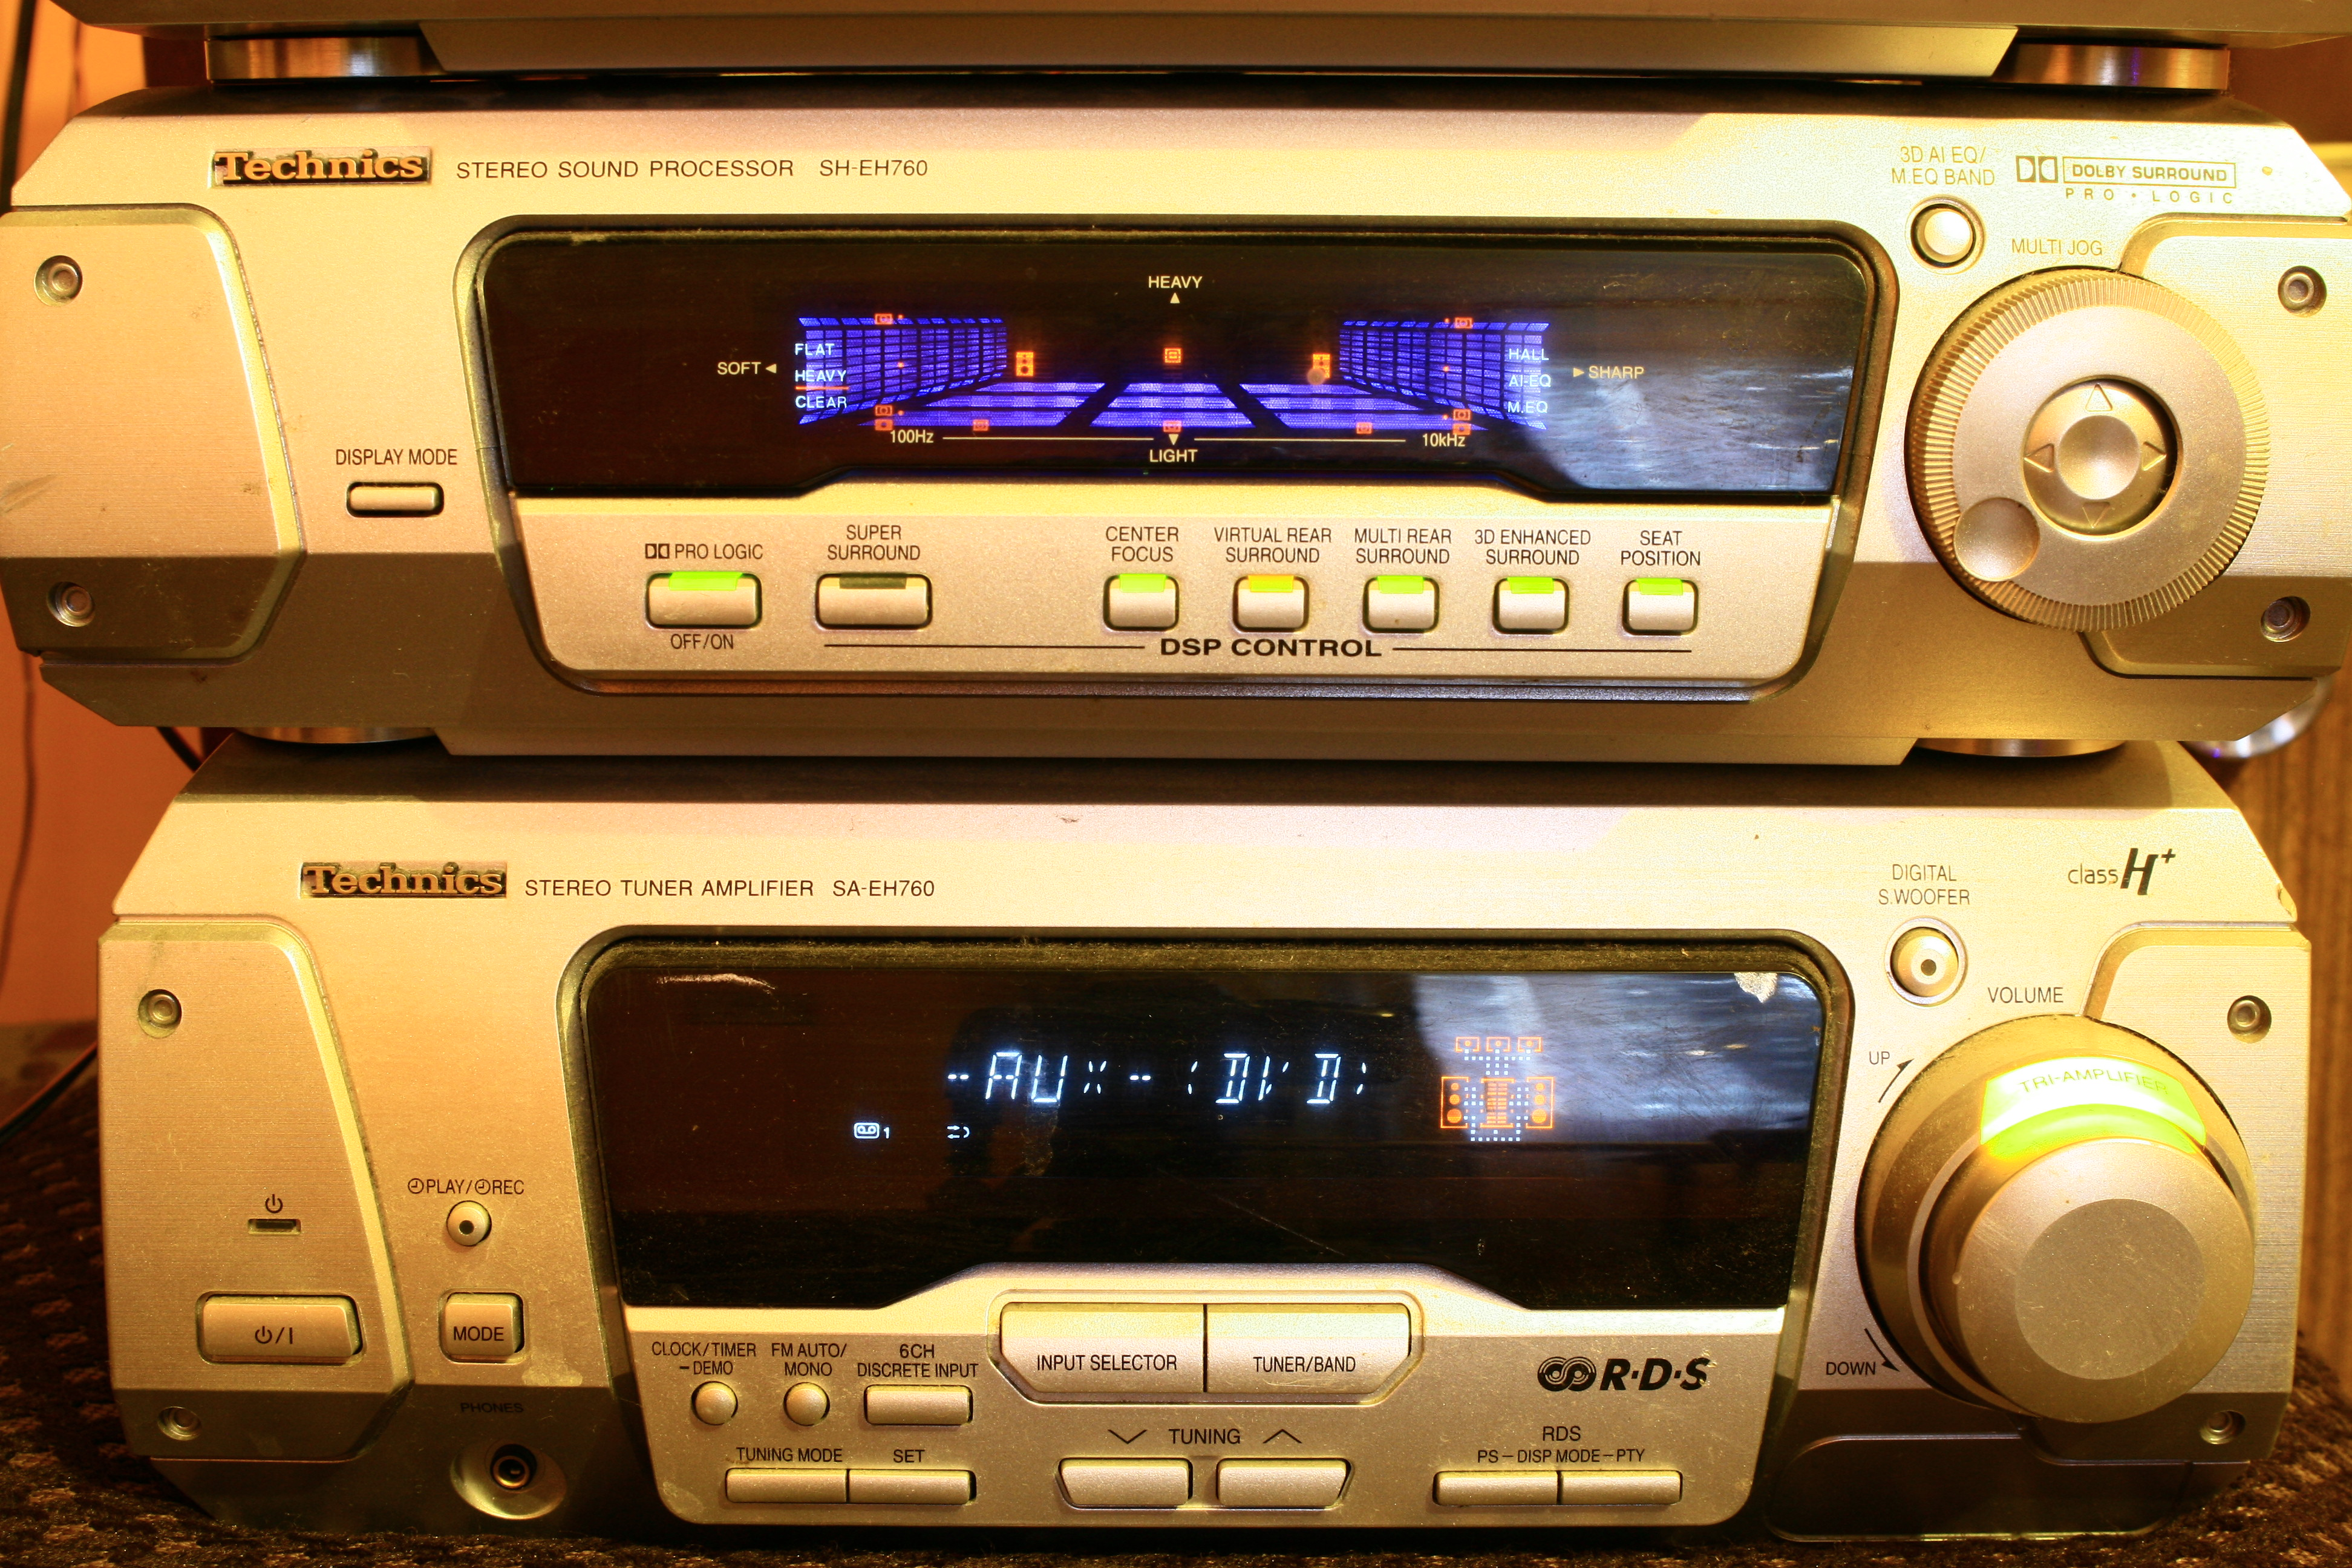 Technics SA-EH760 jak pod��czy� sygna� stereo pod surround